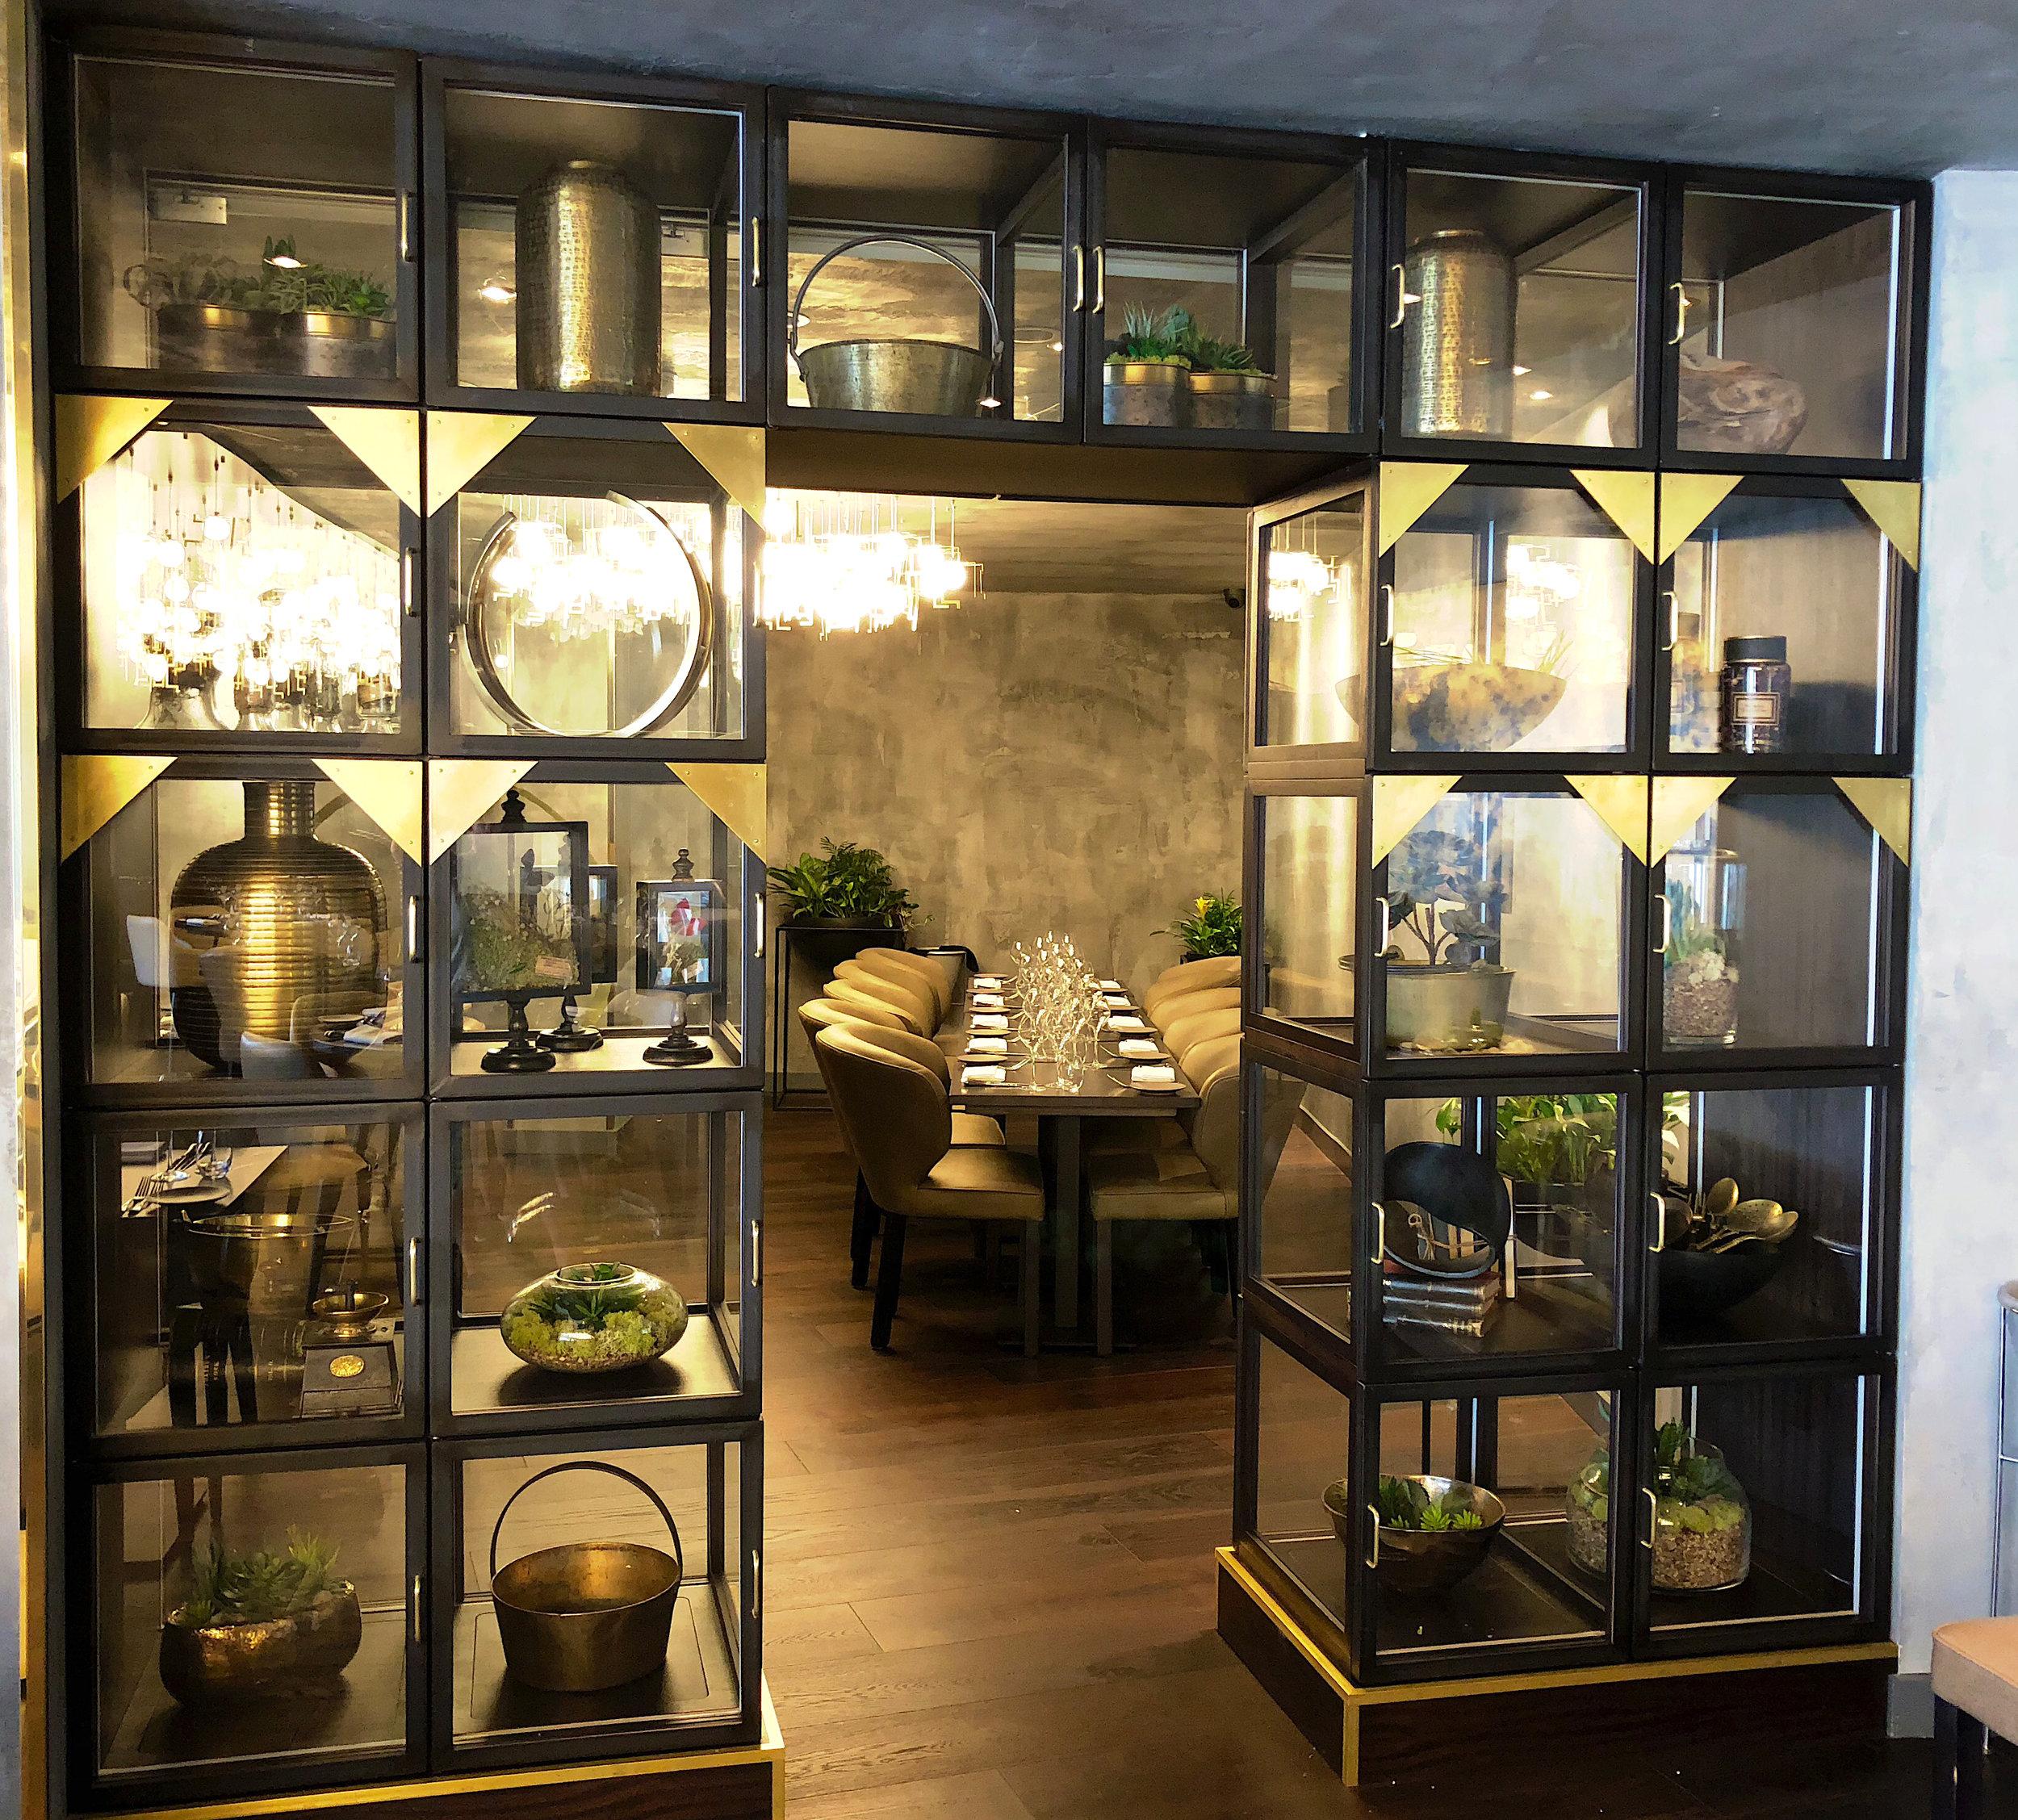 display cabinets.jpg